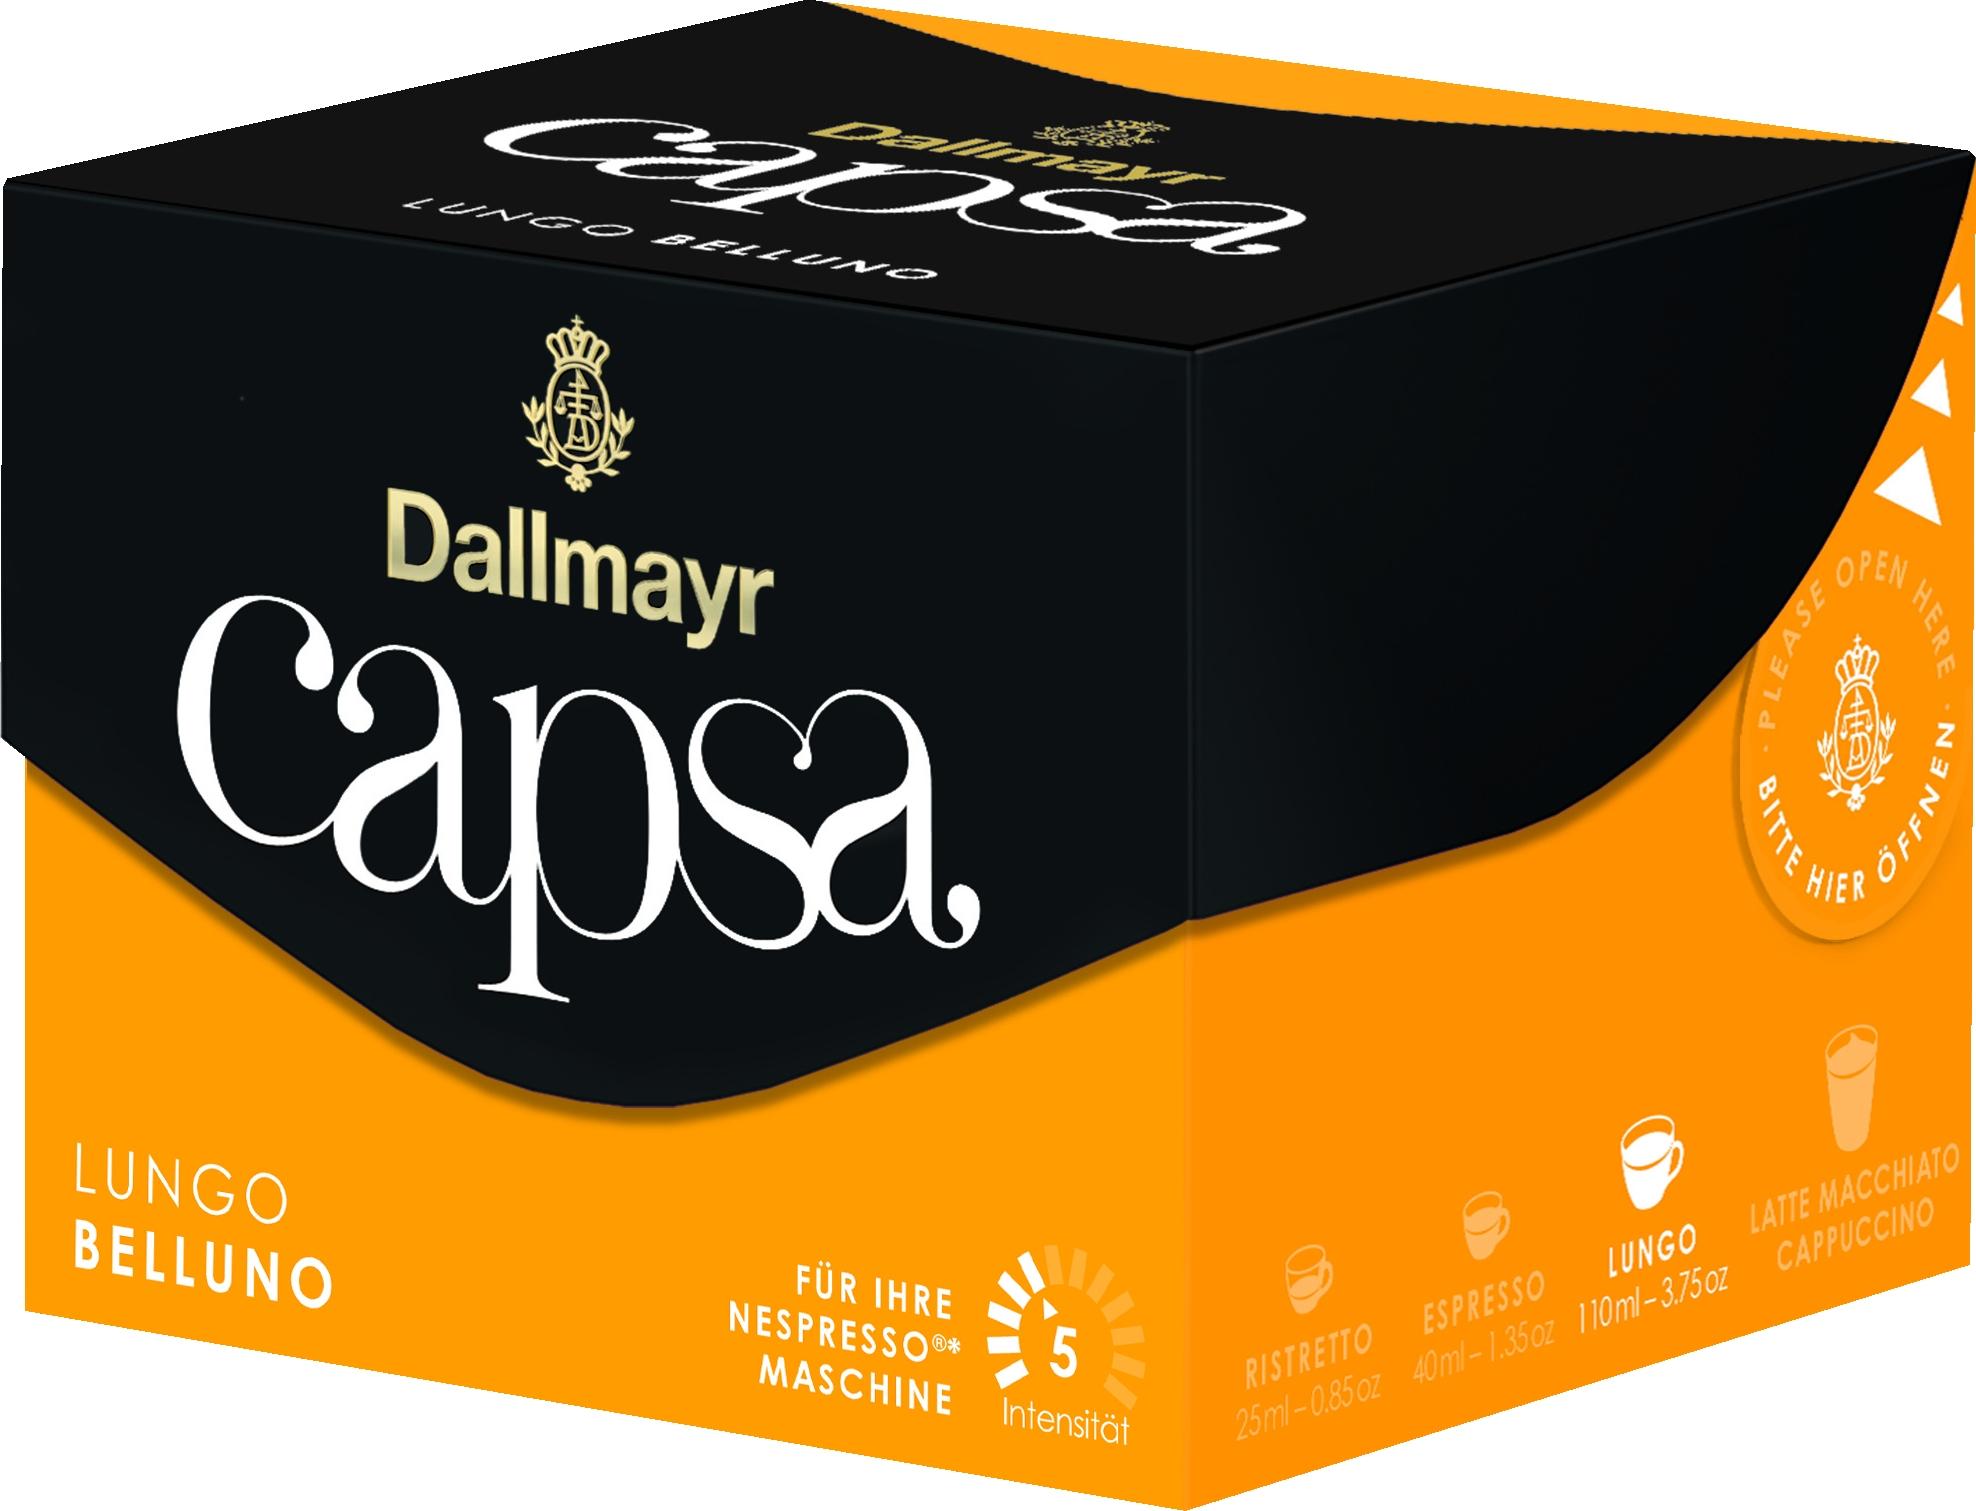 Capsa Lungo Belluno 5 (Nespresso) 10 St.